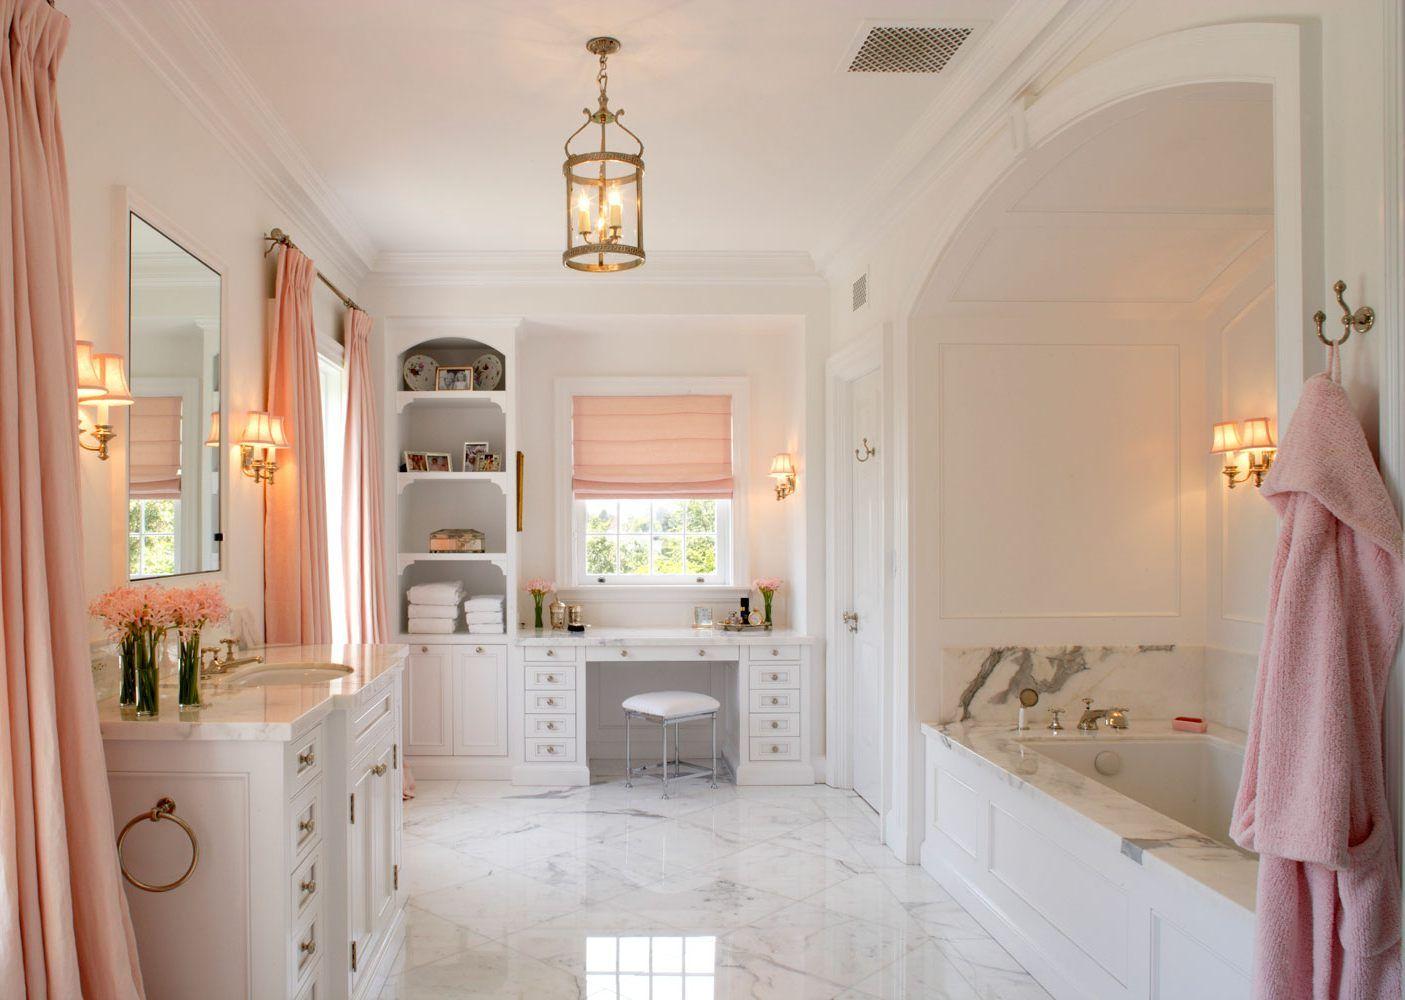 Bad Design Ideen : Kleines badezimmer dekor optionen design ideen